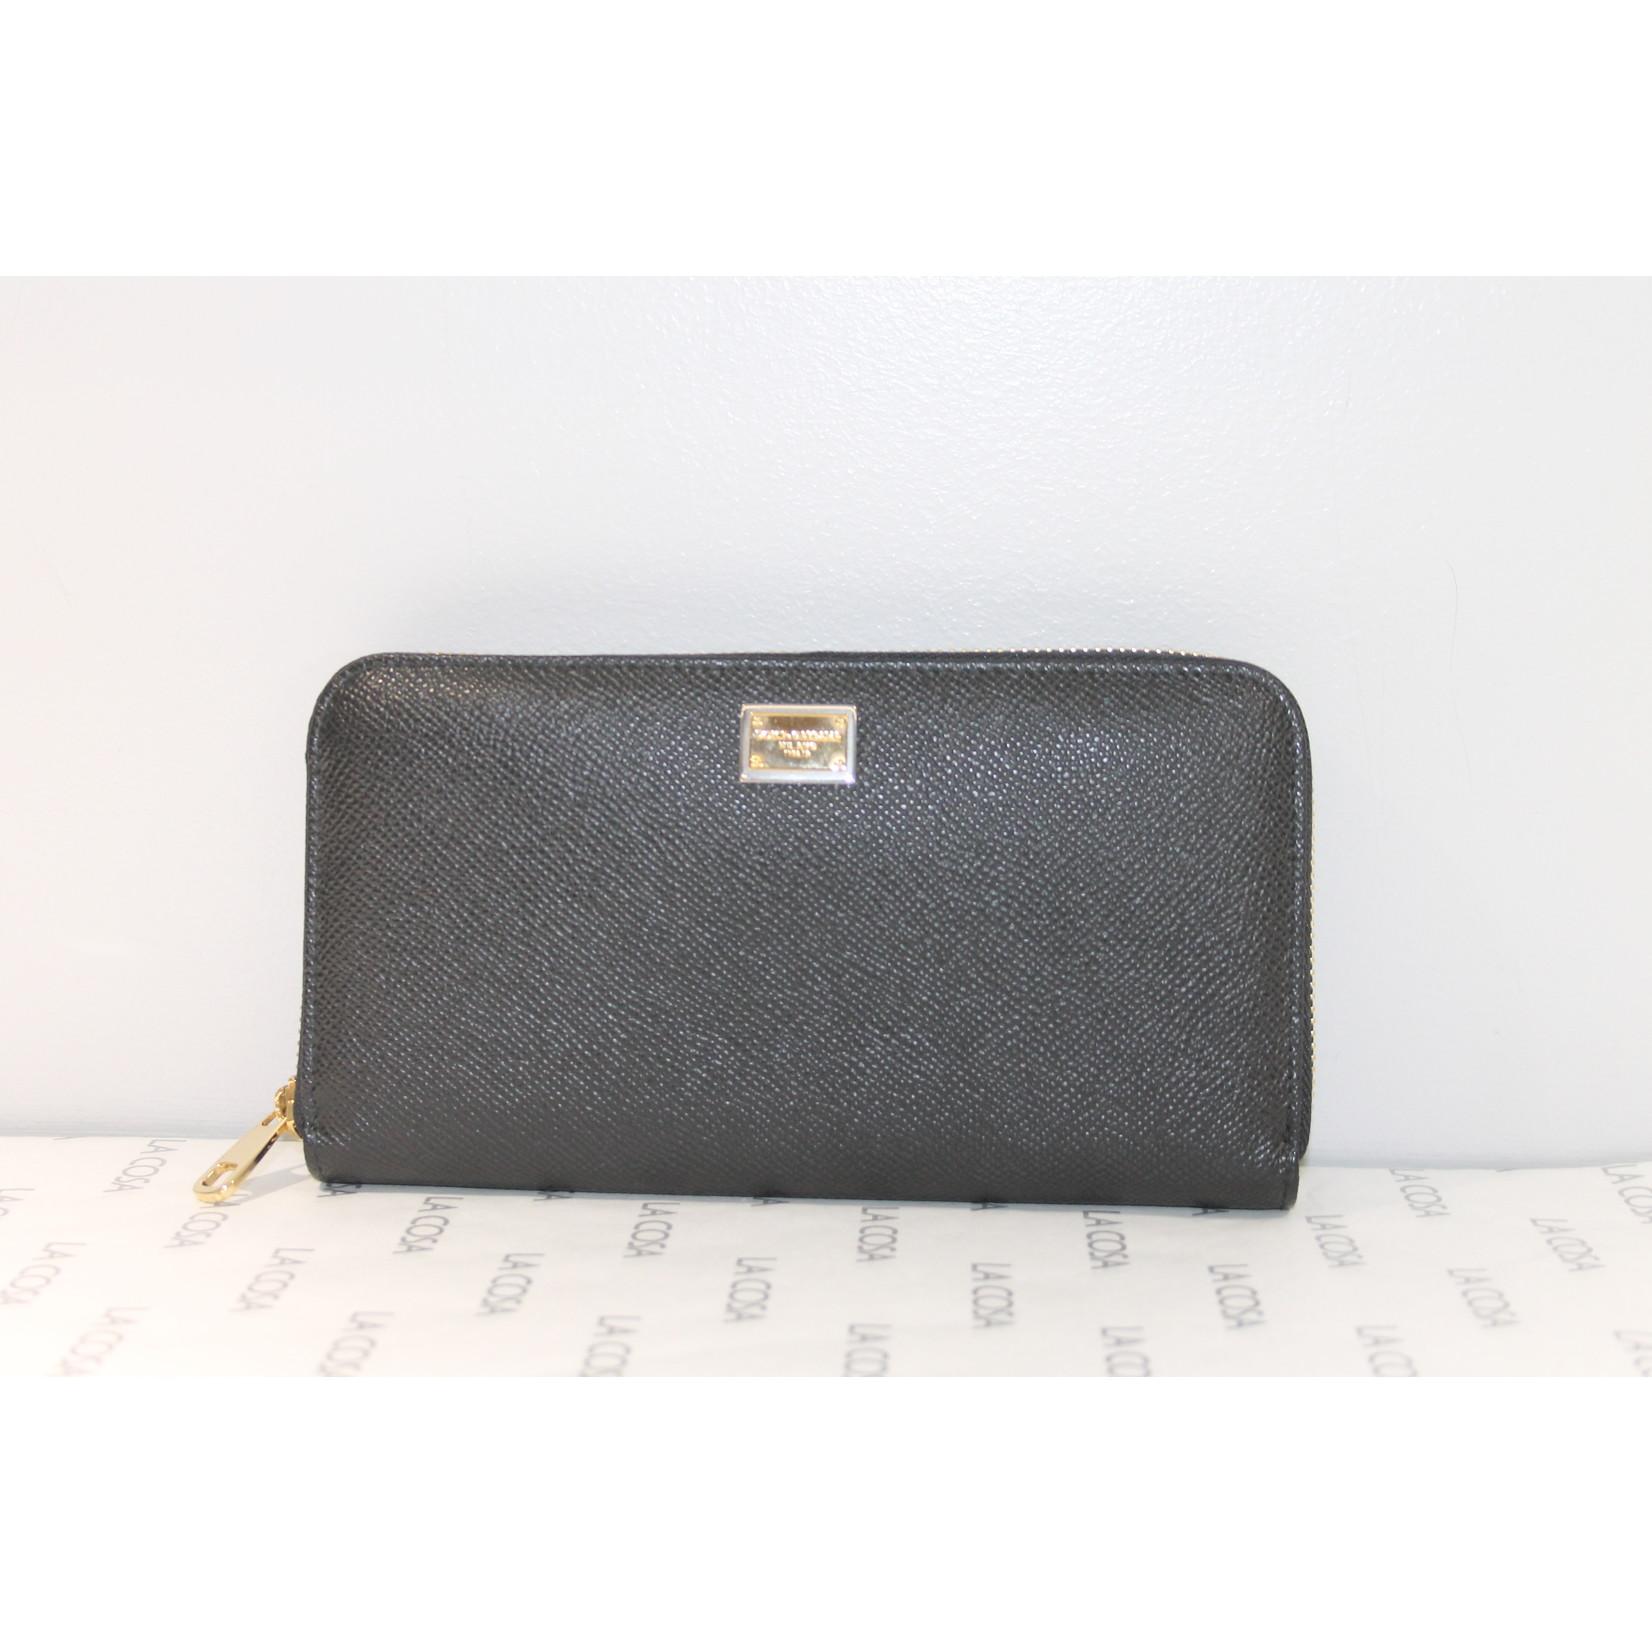 Dolce&Gabbana Tas Portefeuille 35888